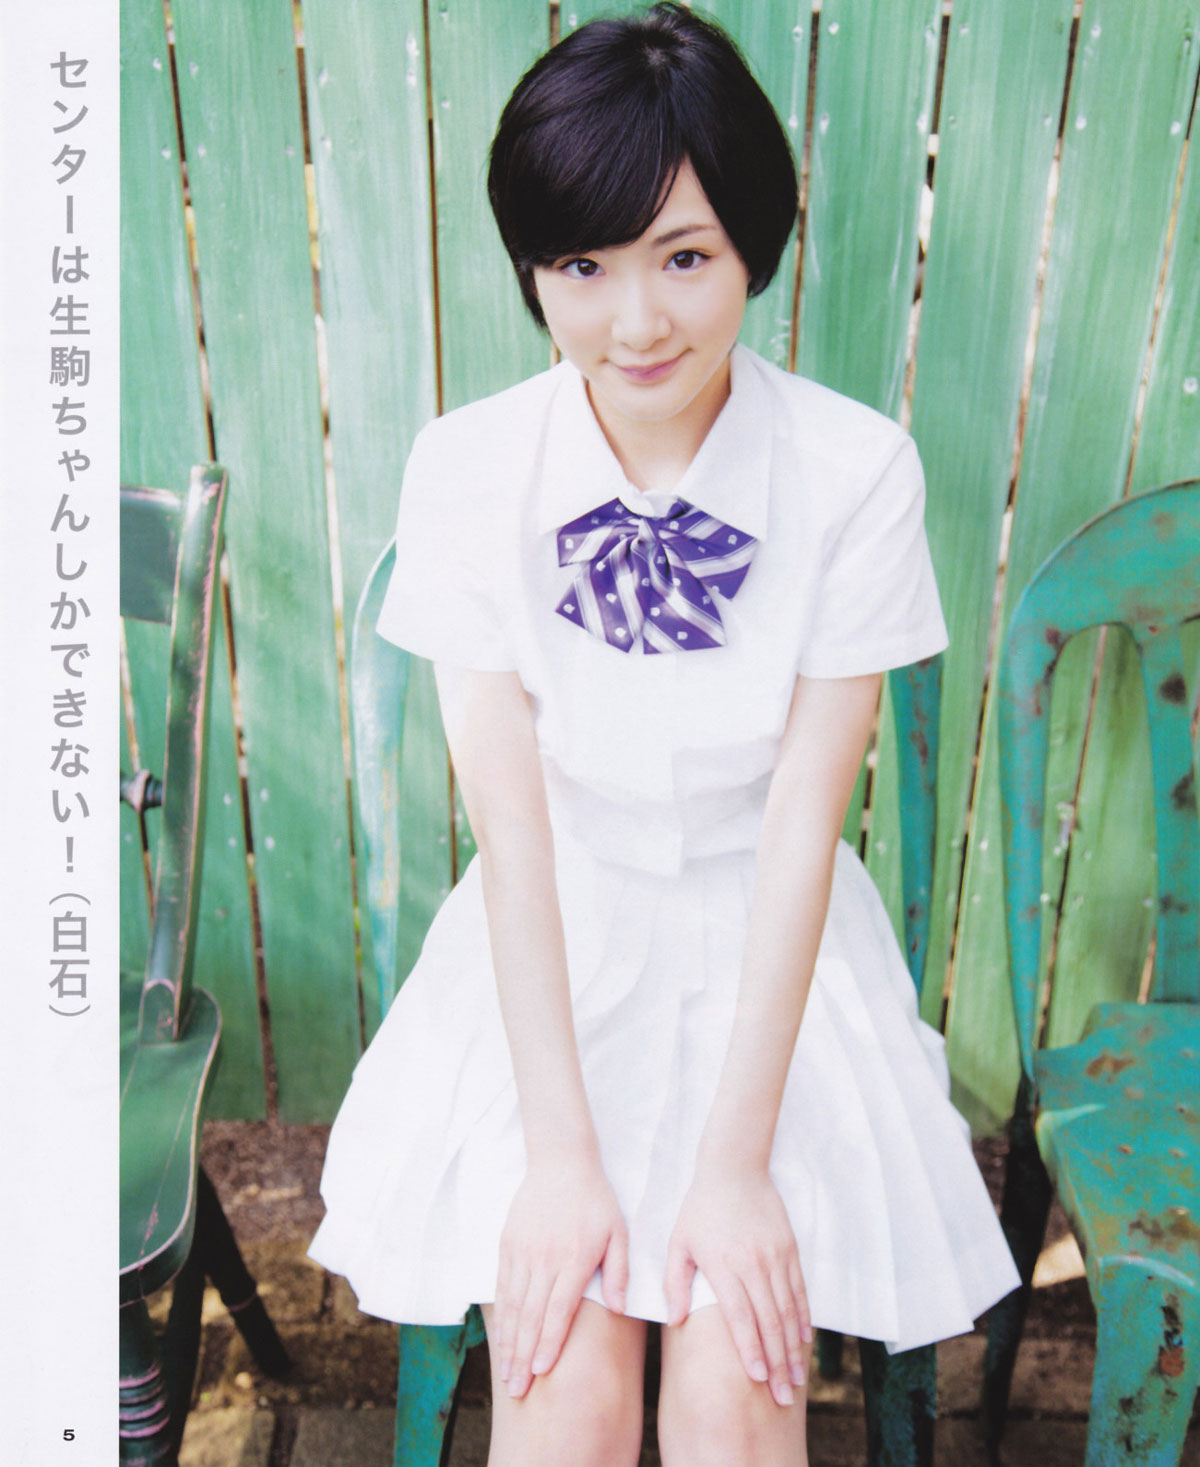 Nogizaka46 Rina Ikoma school girl